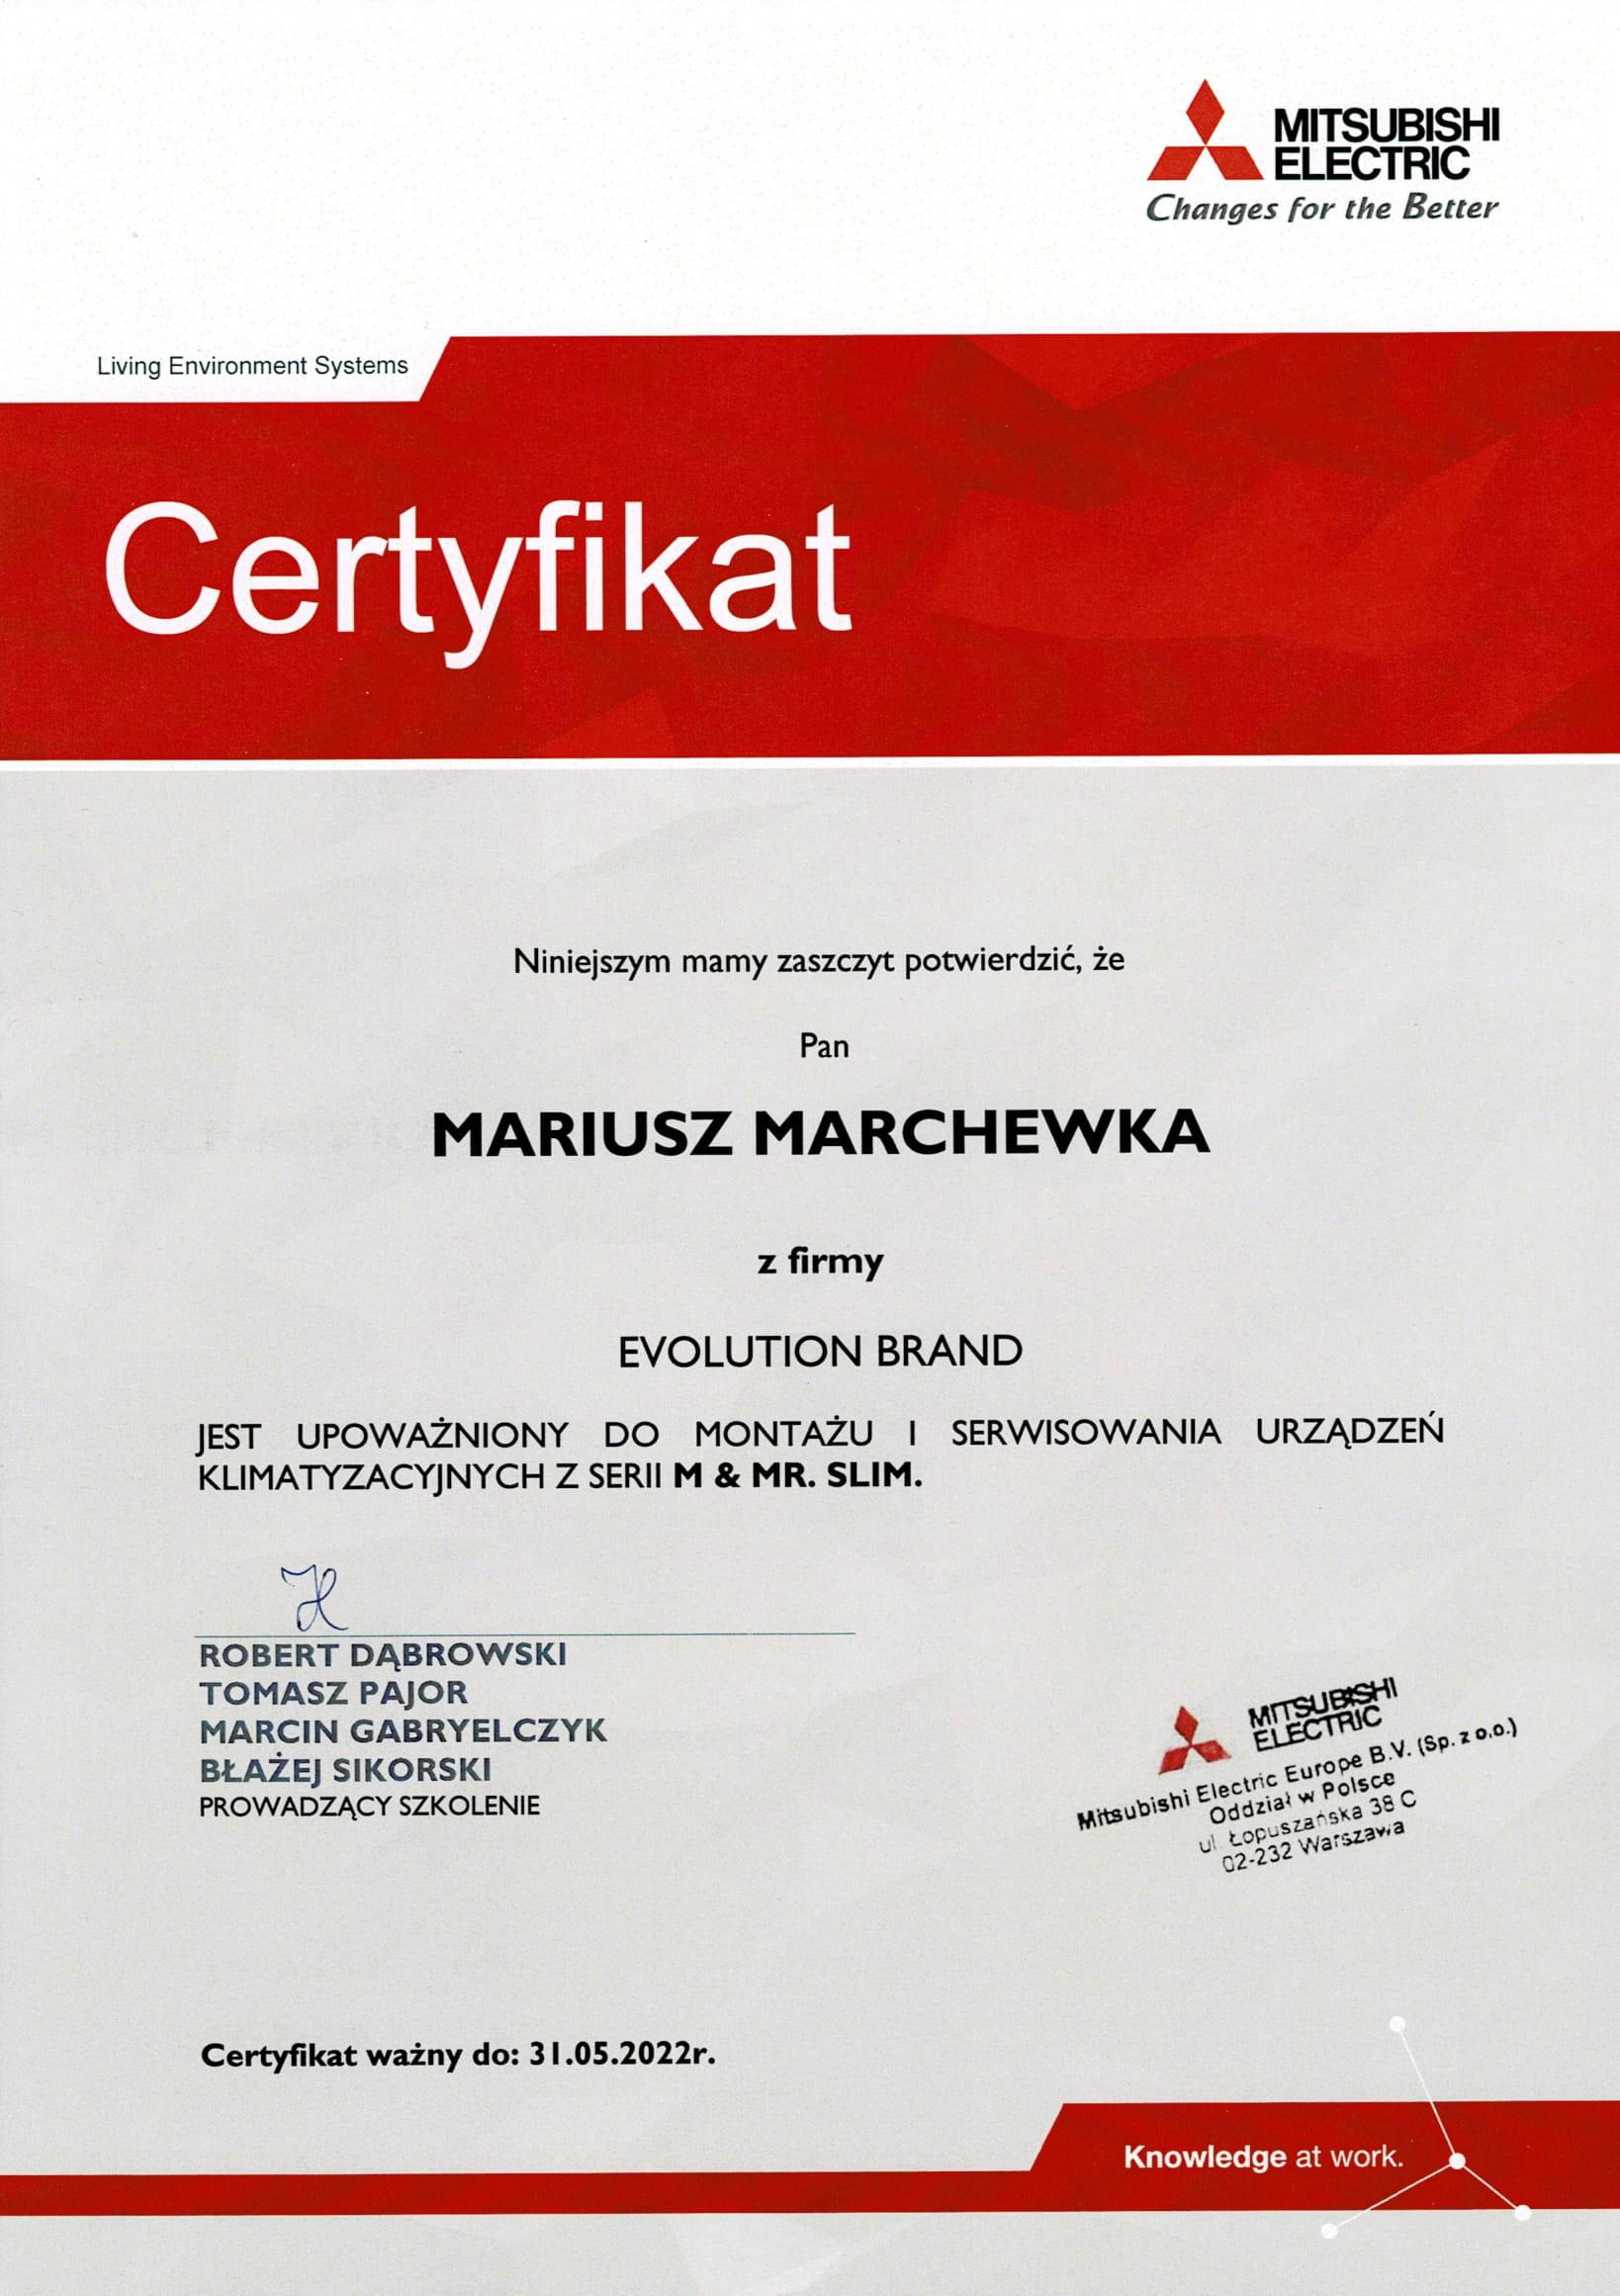 Certyfikat Mitsubishi Electric 2021